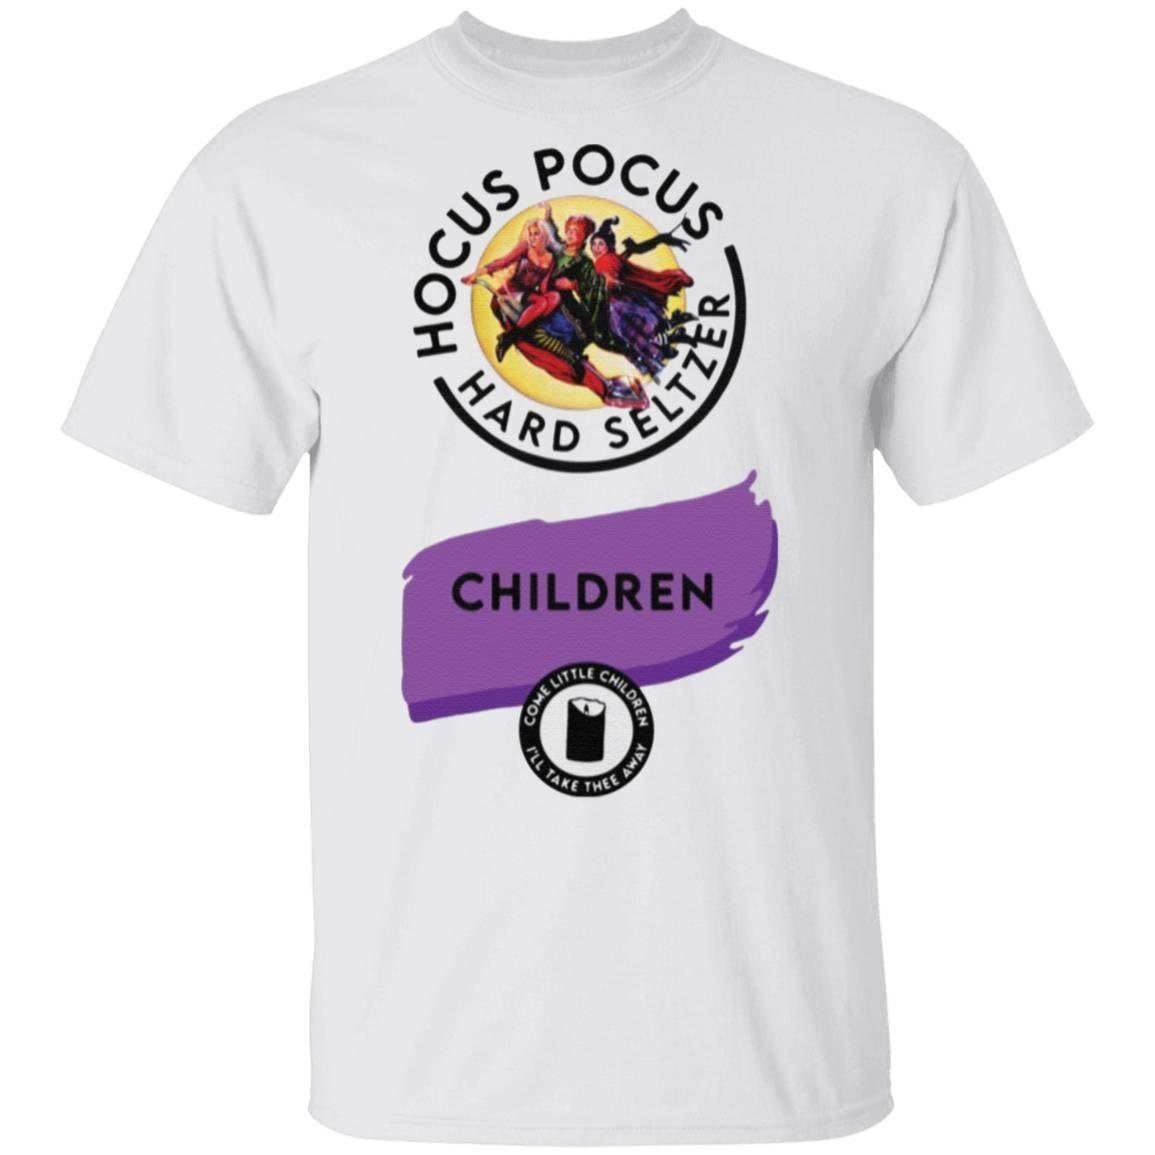 Hocus Pocus Hard Seltzer children come little children t shirt